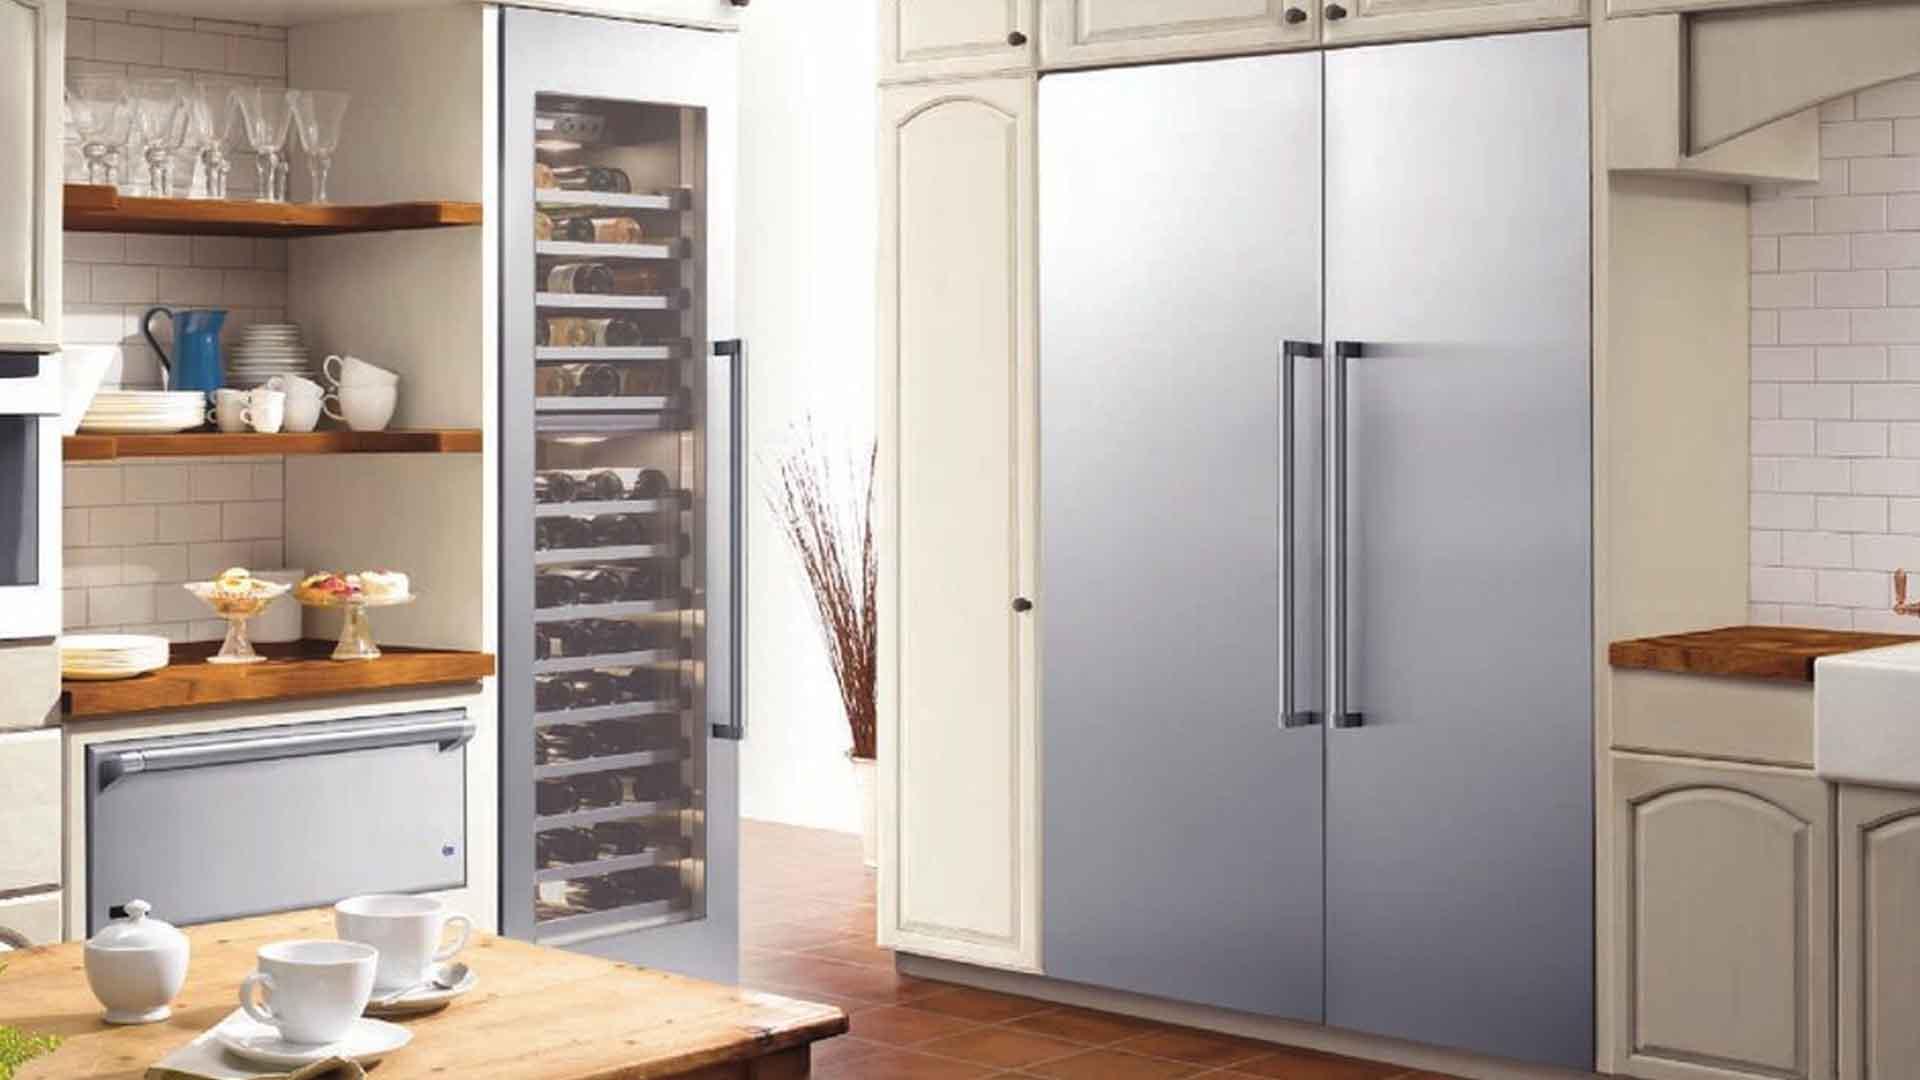 Thermador Refrigerator Columns Repair Service | Thermador Appliance Repair Pros